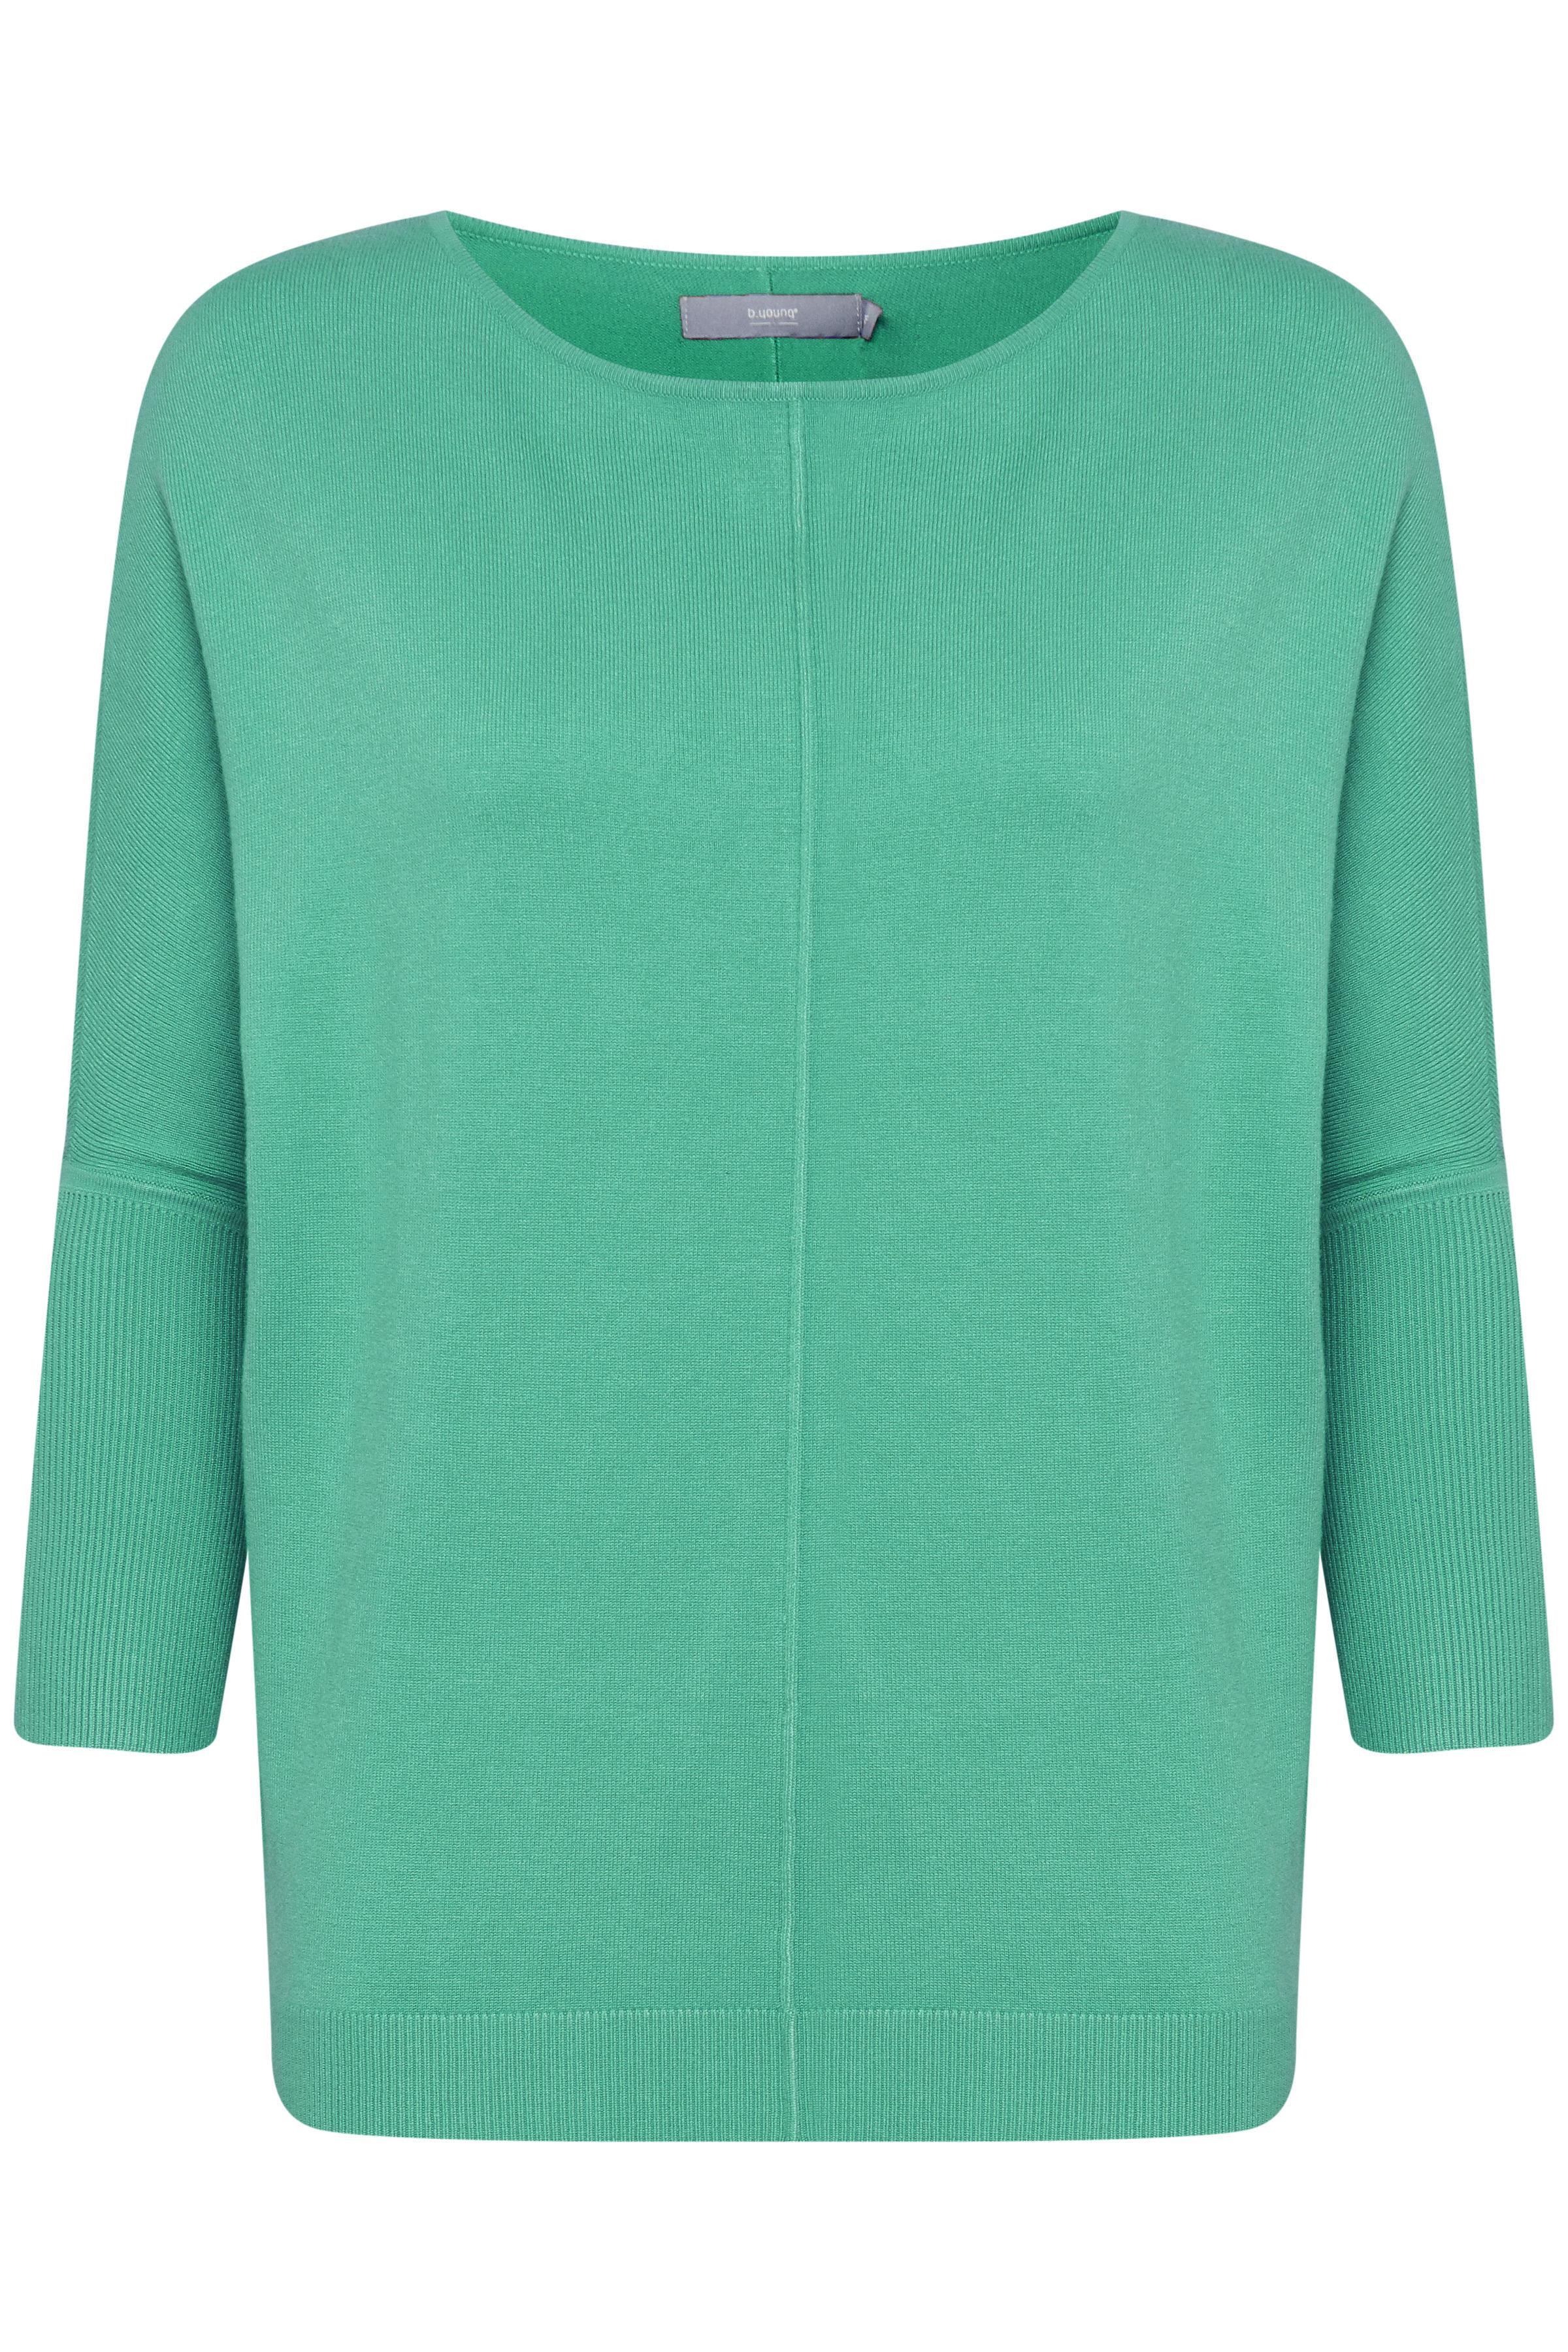 MEL. Fresh Green Pullover van b.young – Koop MEL. Fresh Green Pullover hier van size XS-XXL